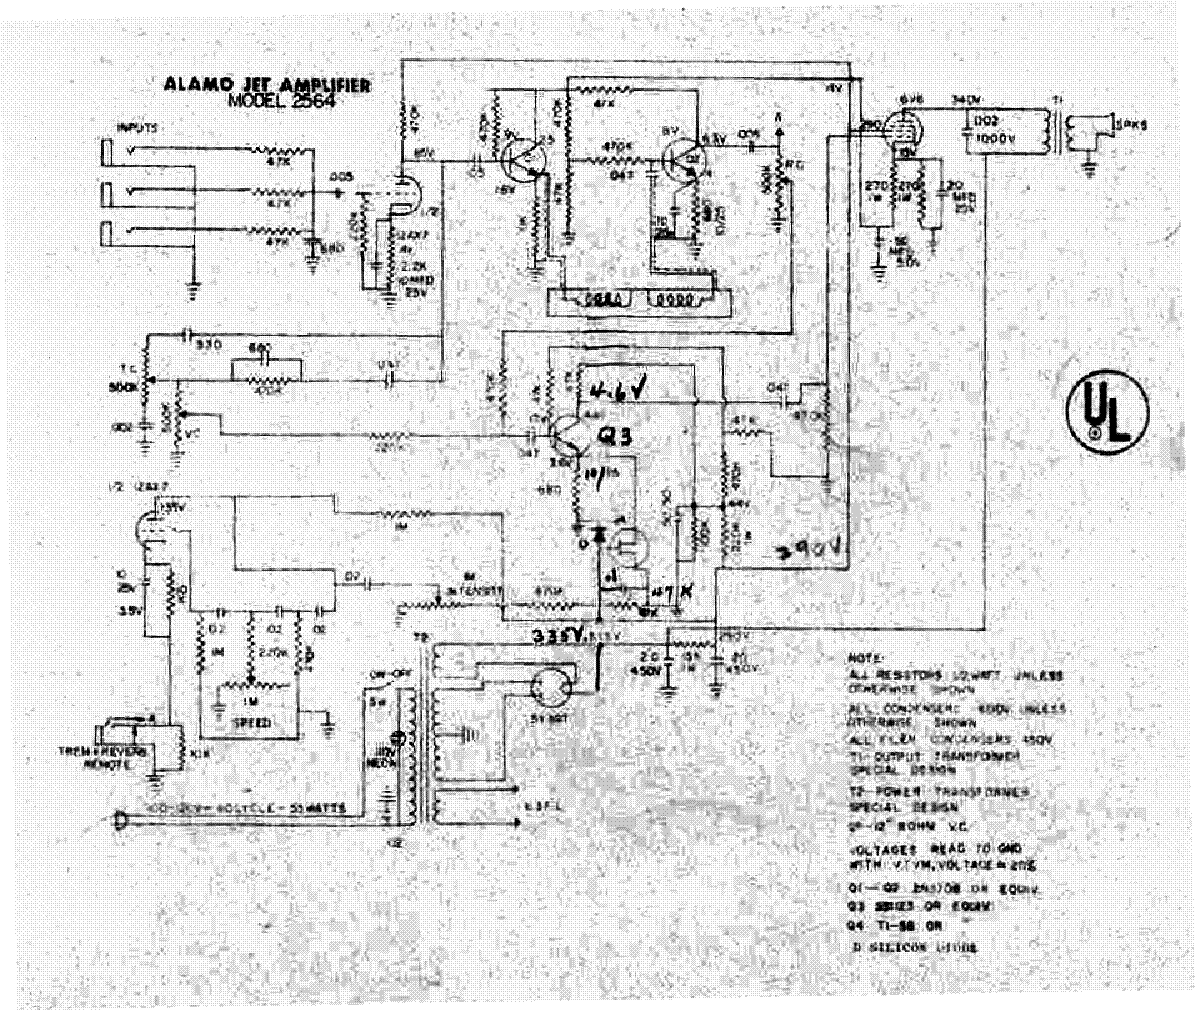 ALAMO JET-2564 SCH service manual (1st page)